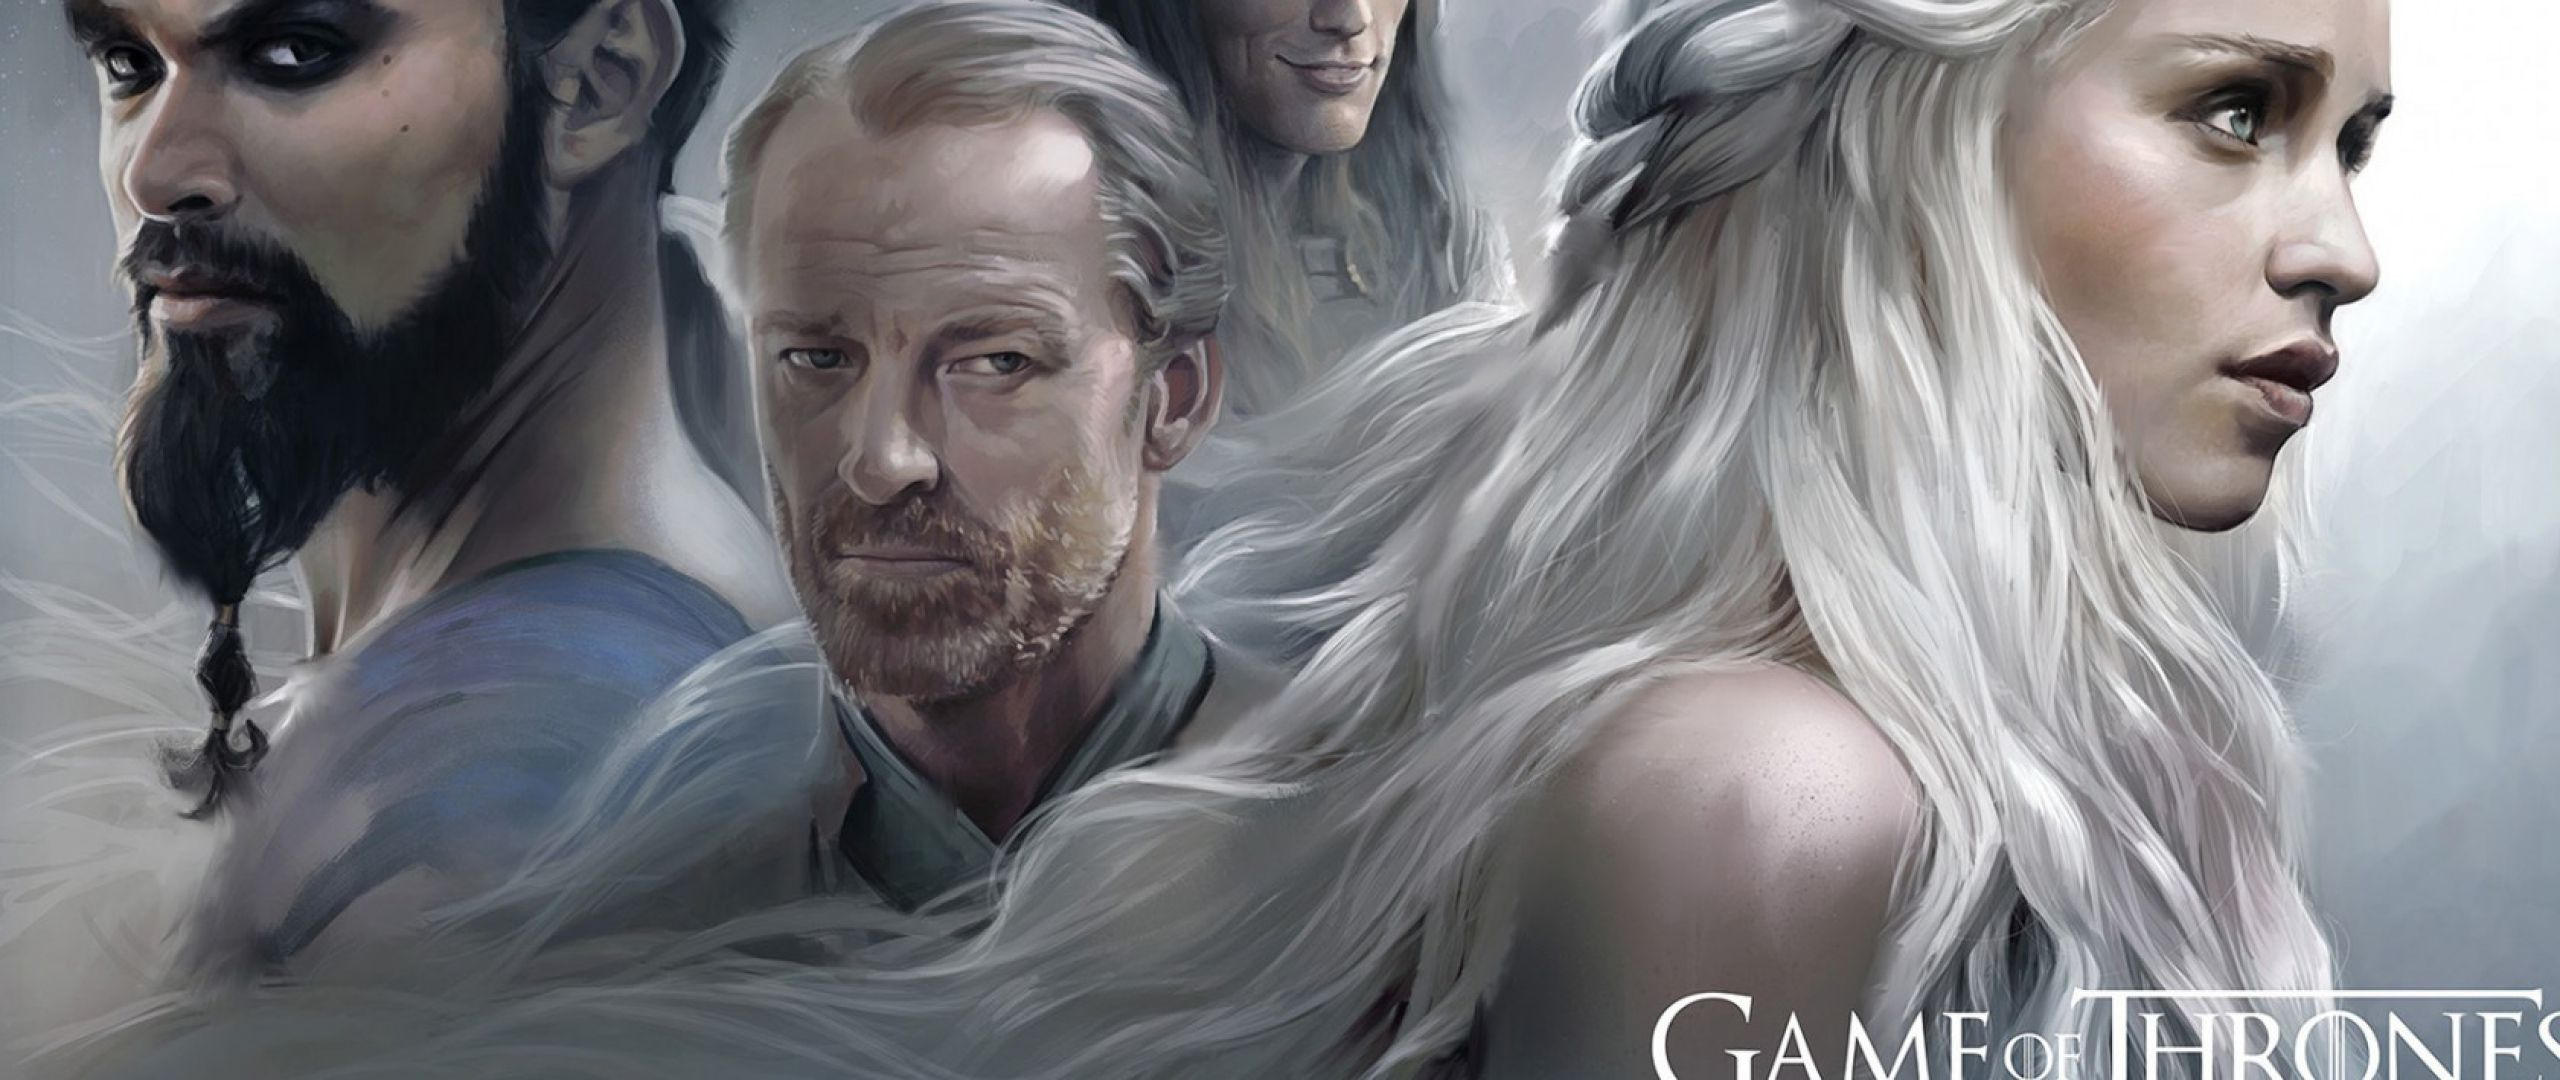 2560x1080 Wallpaper Game Of Thrones Emilia Clarke Daenerys Targaryen Khal Drogo Jason Momoa Jorah Mormont Hbo